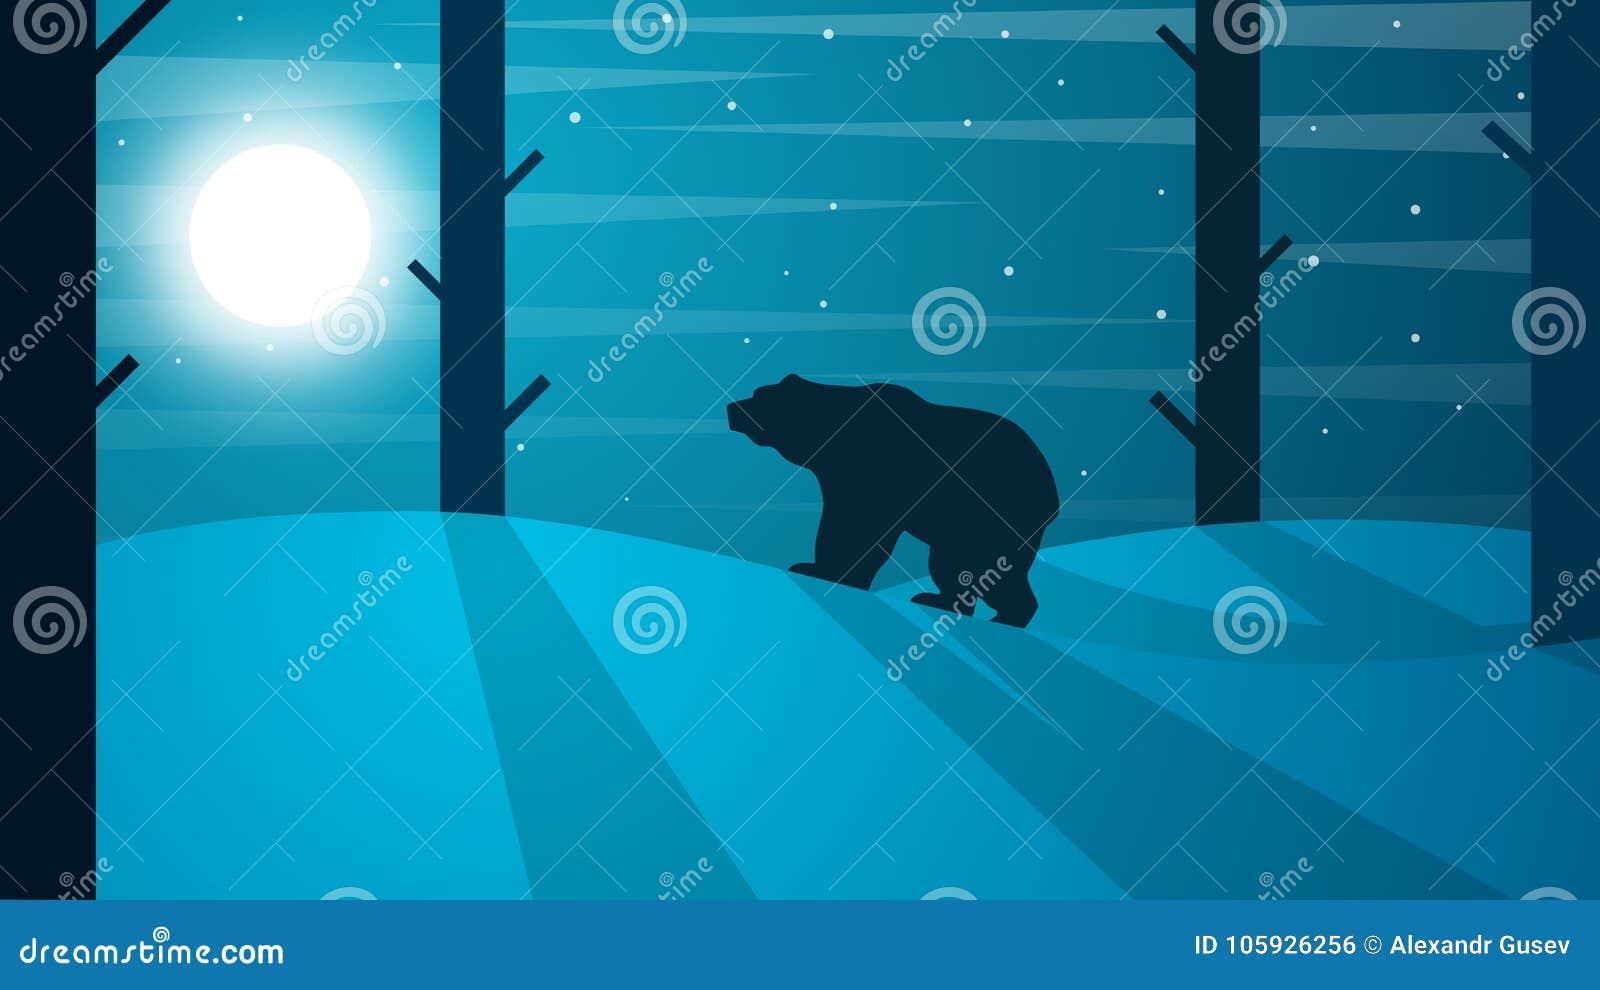 Иллюстрация медведя шаржа зима температуры России ландшафта 33c января ural Дерево, солнце, лягушка